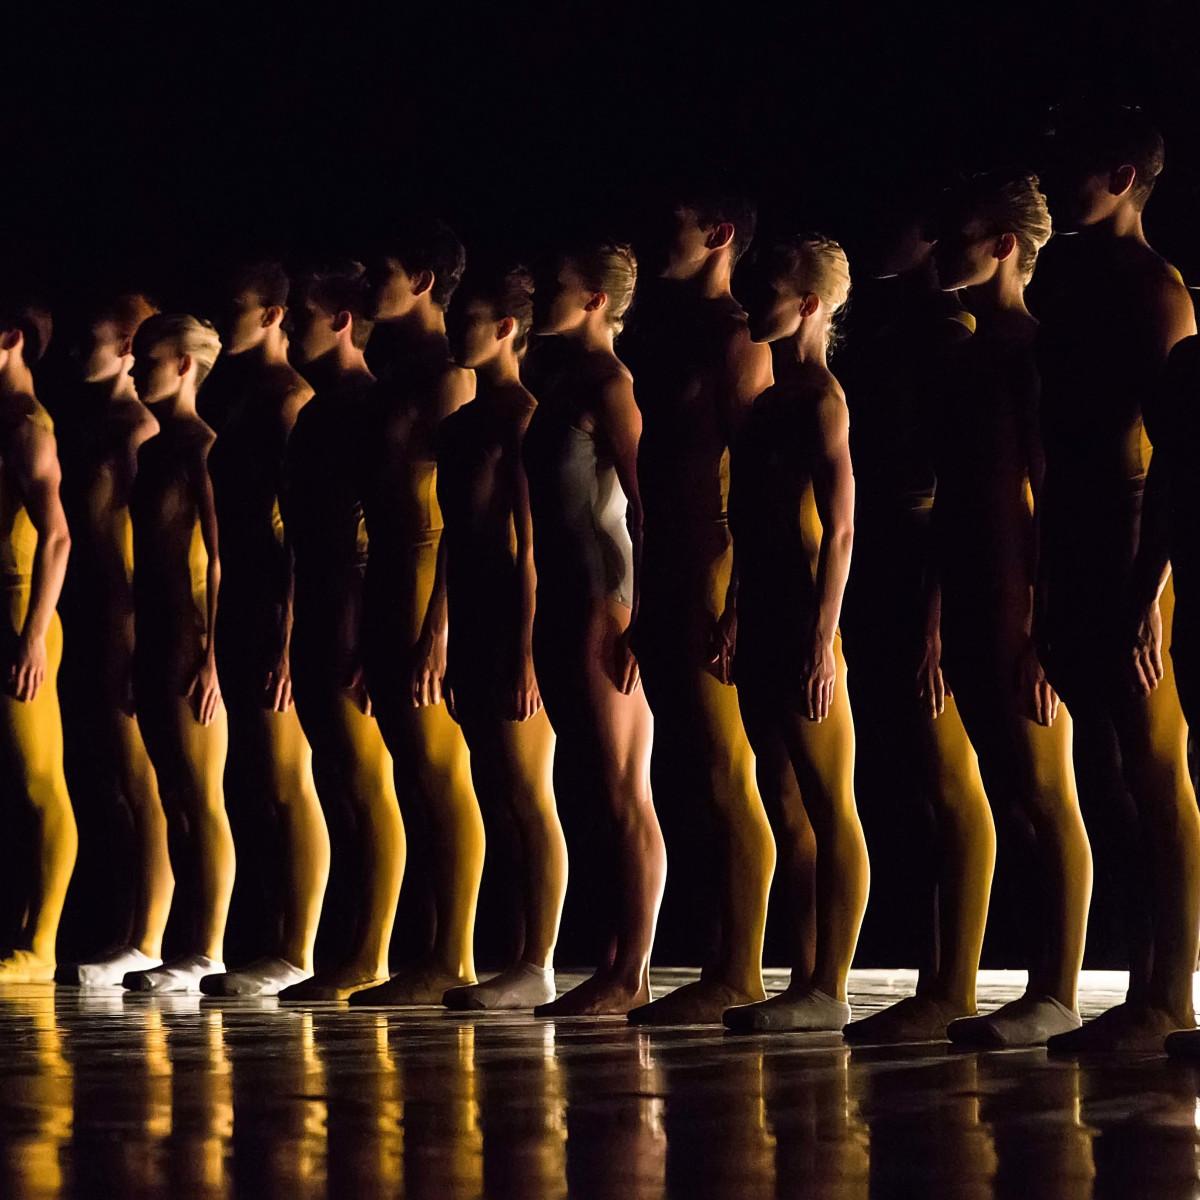 Houston Ballet 9.16, Artifact Suite